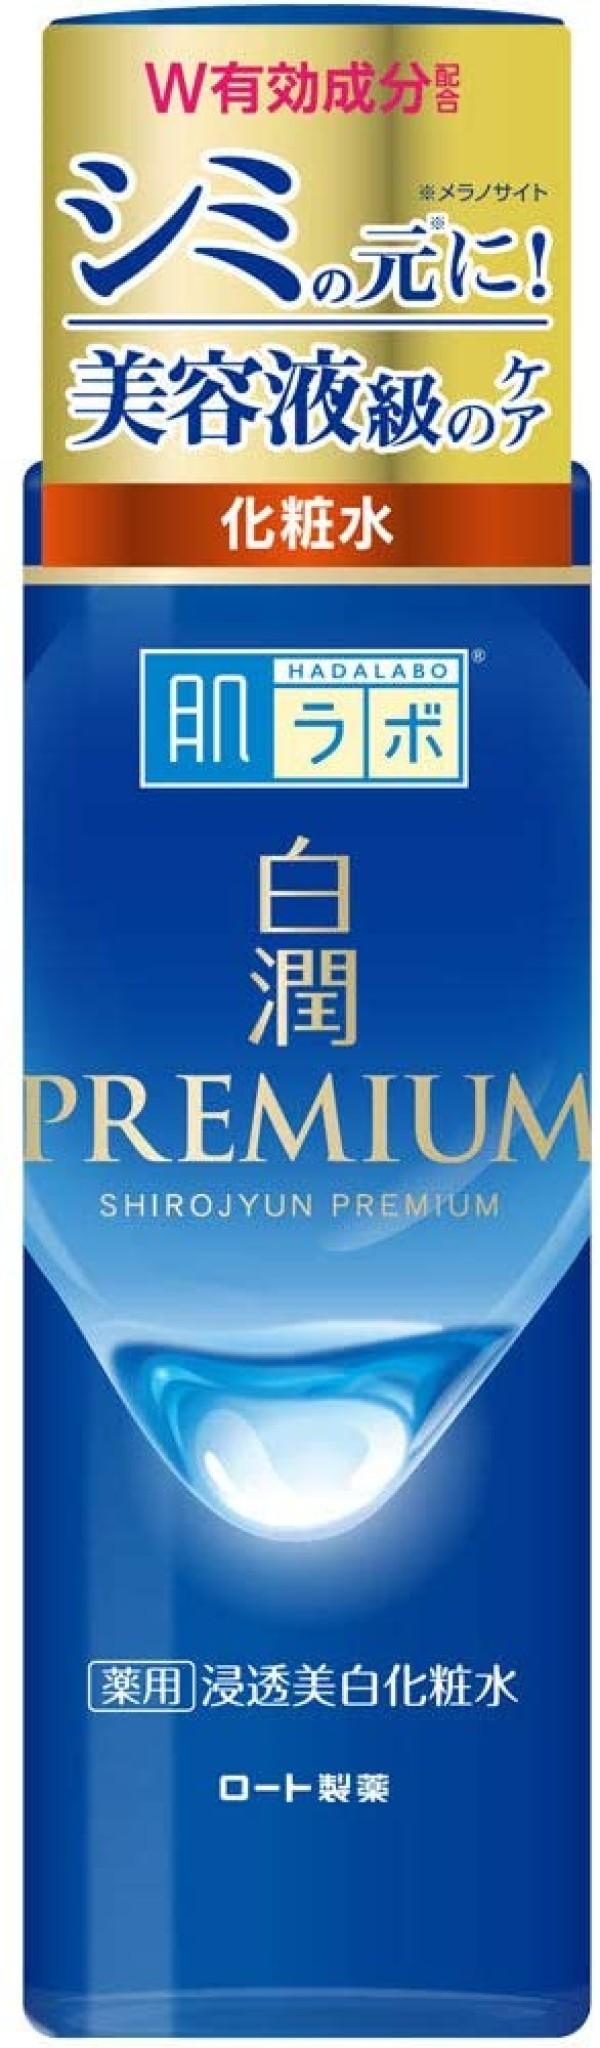 Увлажняющий и отбеливающий лосьон Rohto Hada Labo Shirojyun Premium Whitening Medicated Lotion